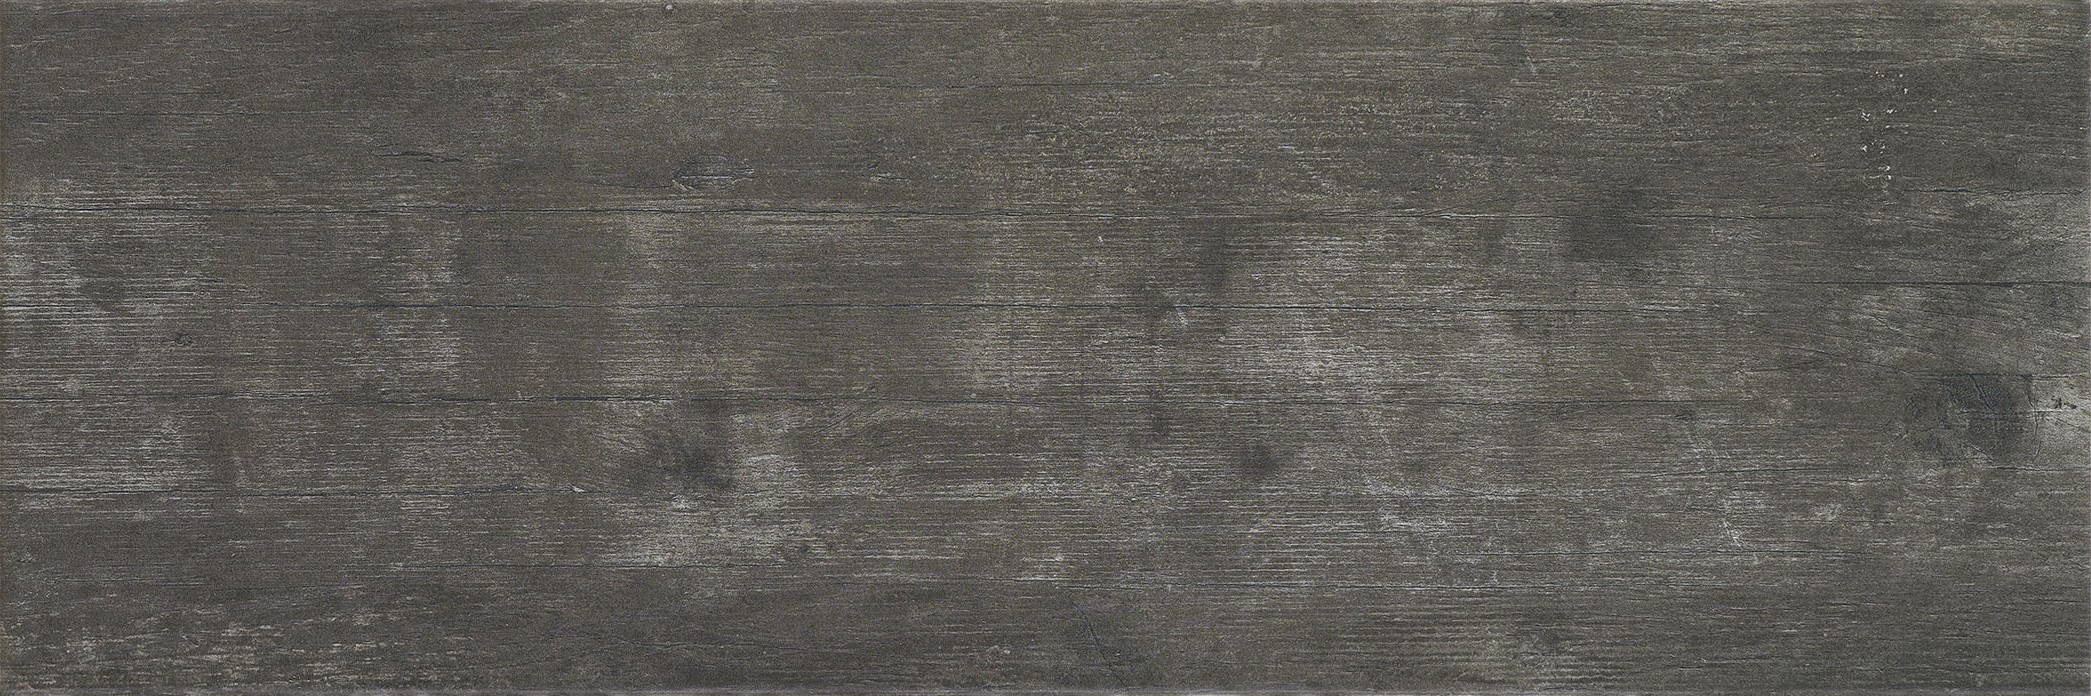 Endor gris mate 20,5x61,5 - Hansas Plaadimaailm